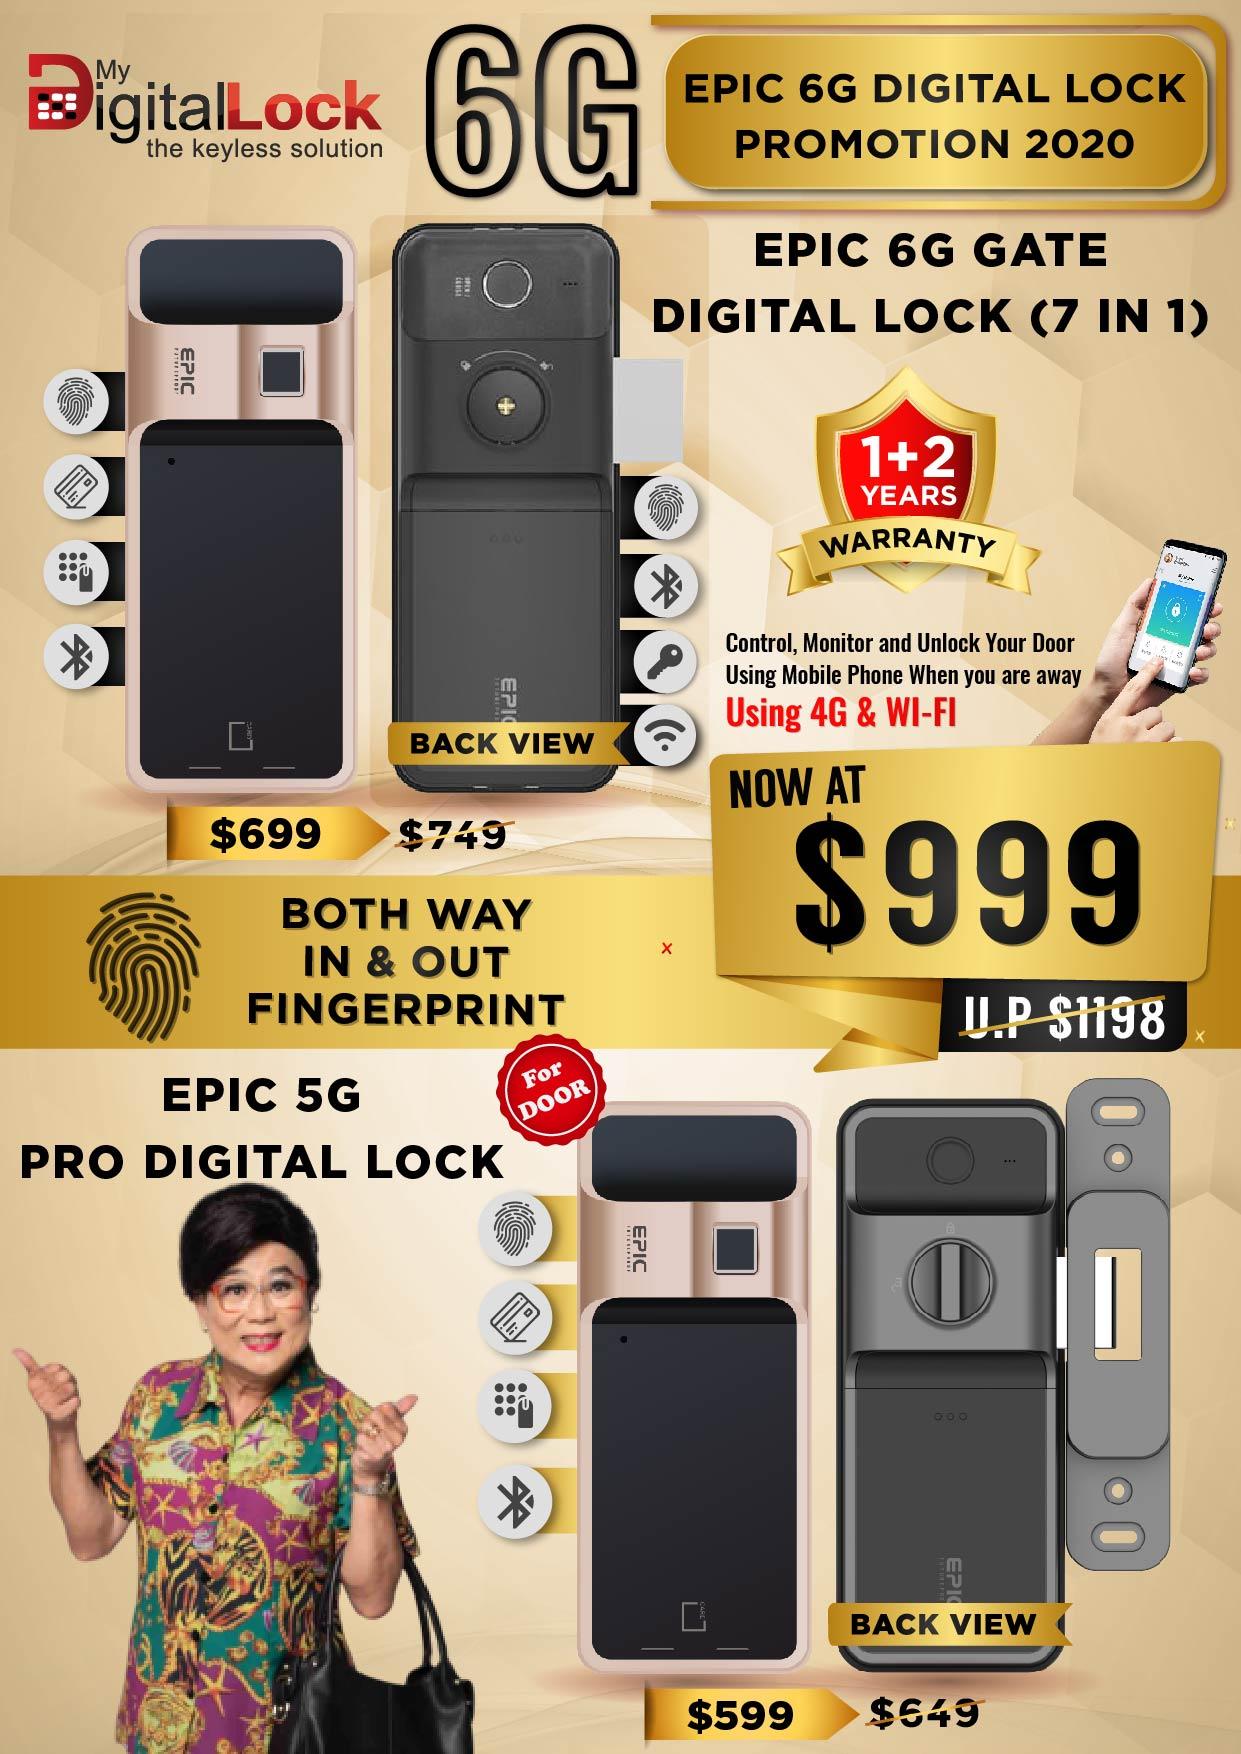 EPIC 6G Gate and 5G Door Digital Lock